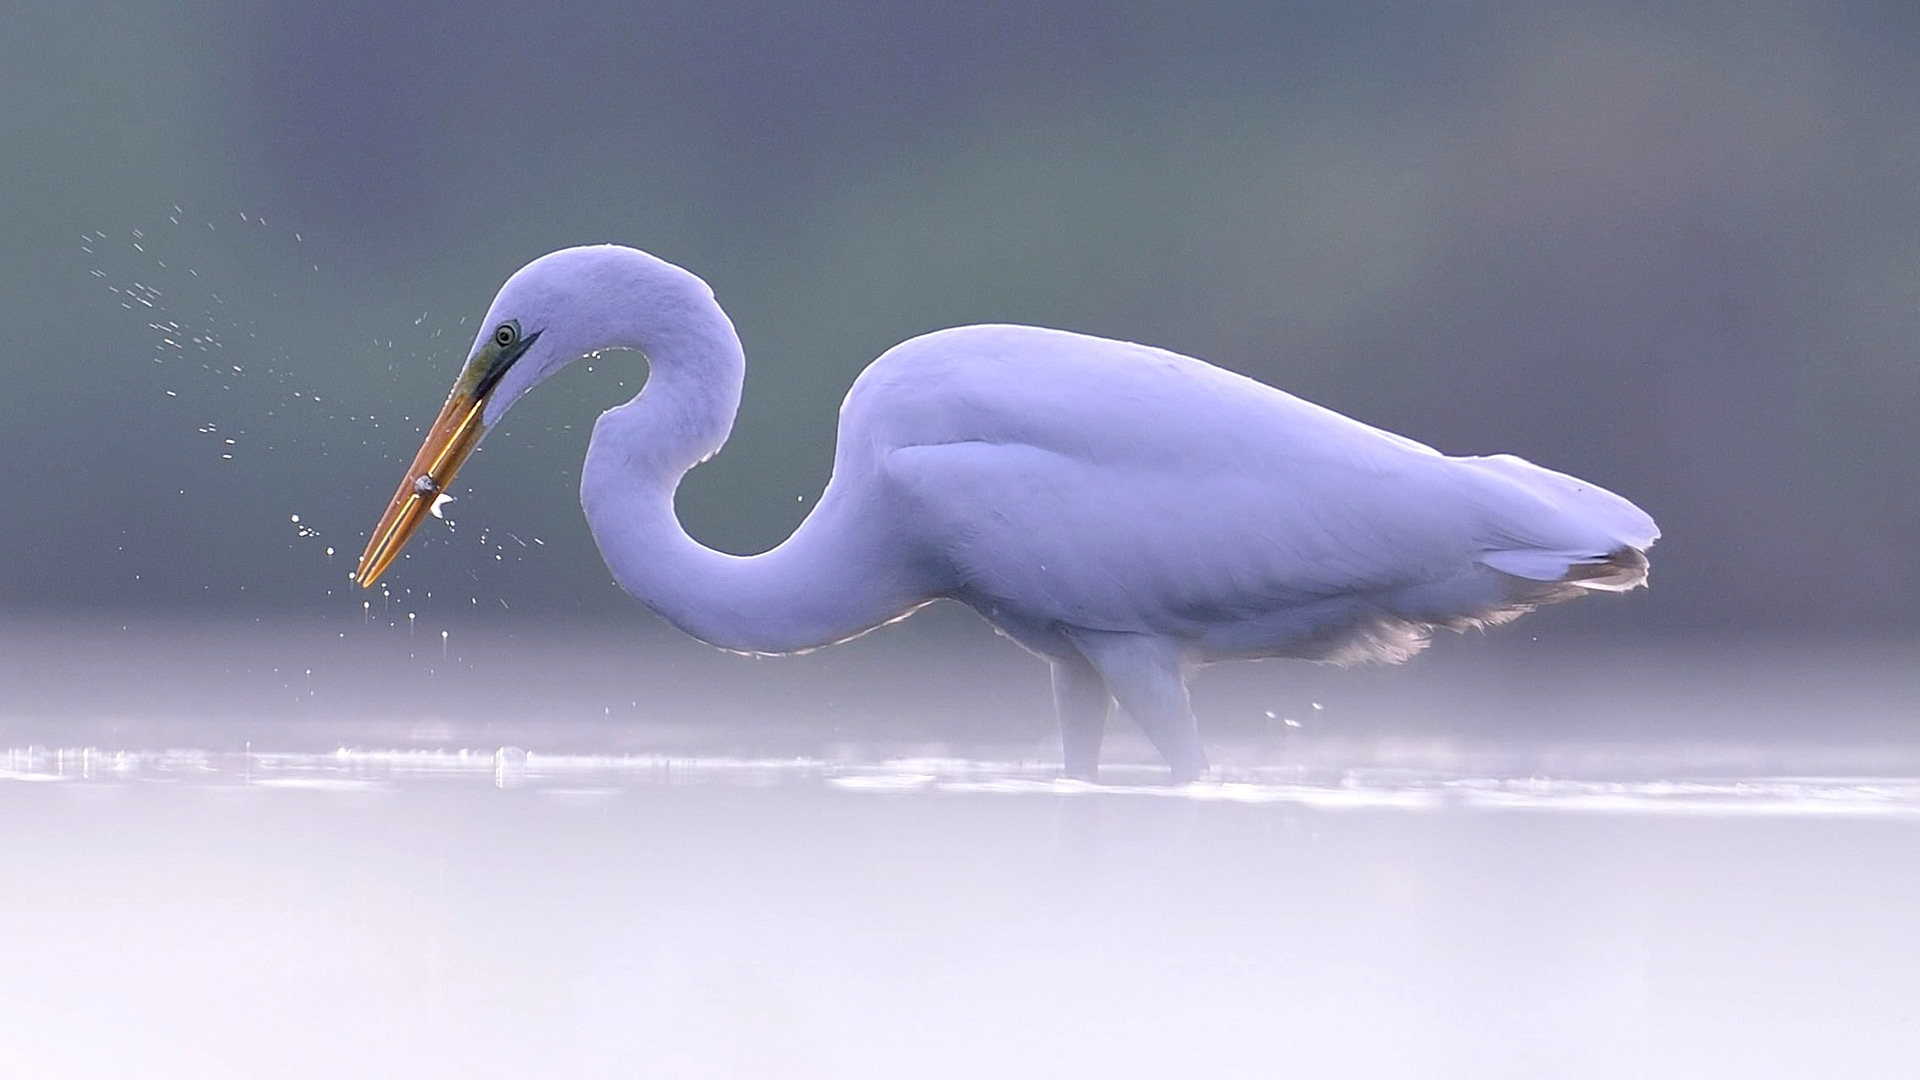 Image: South Korea animals - heron